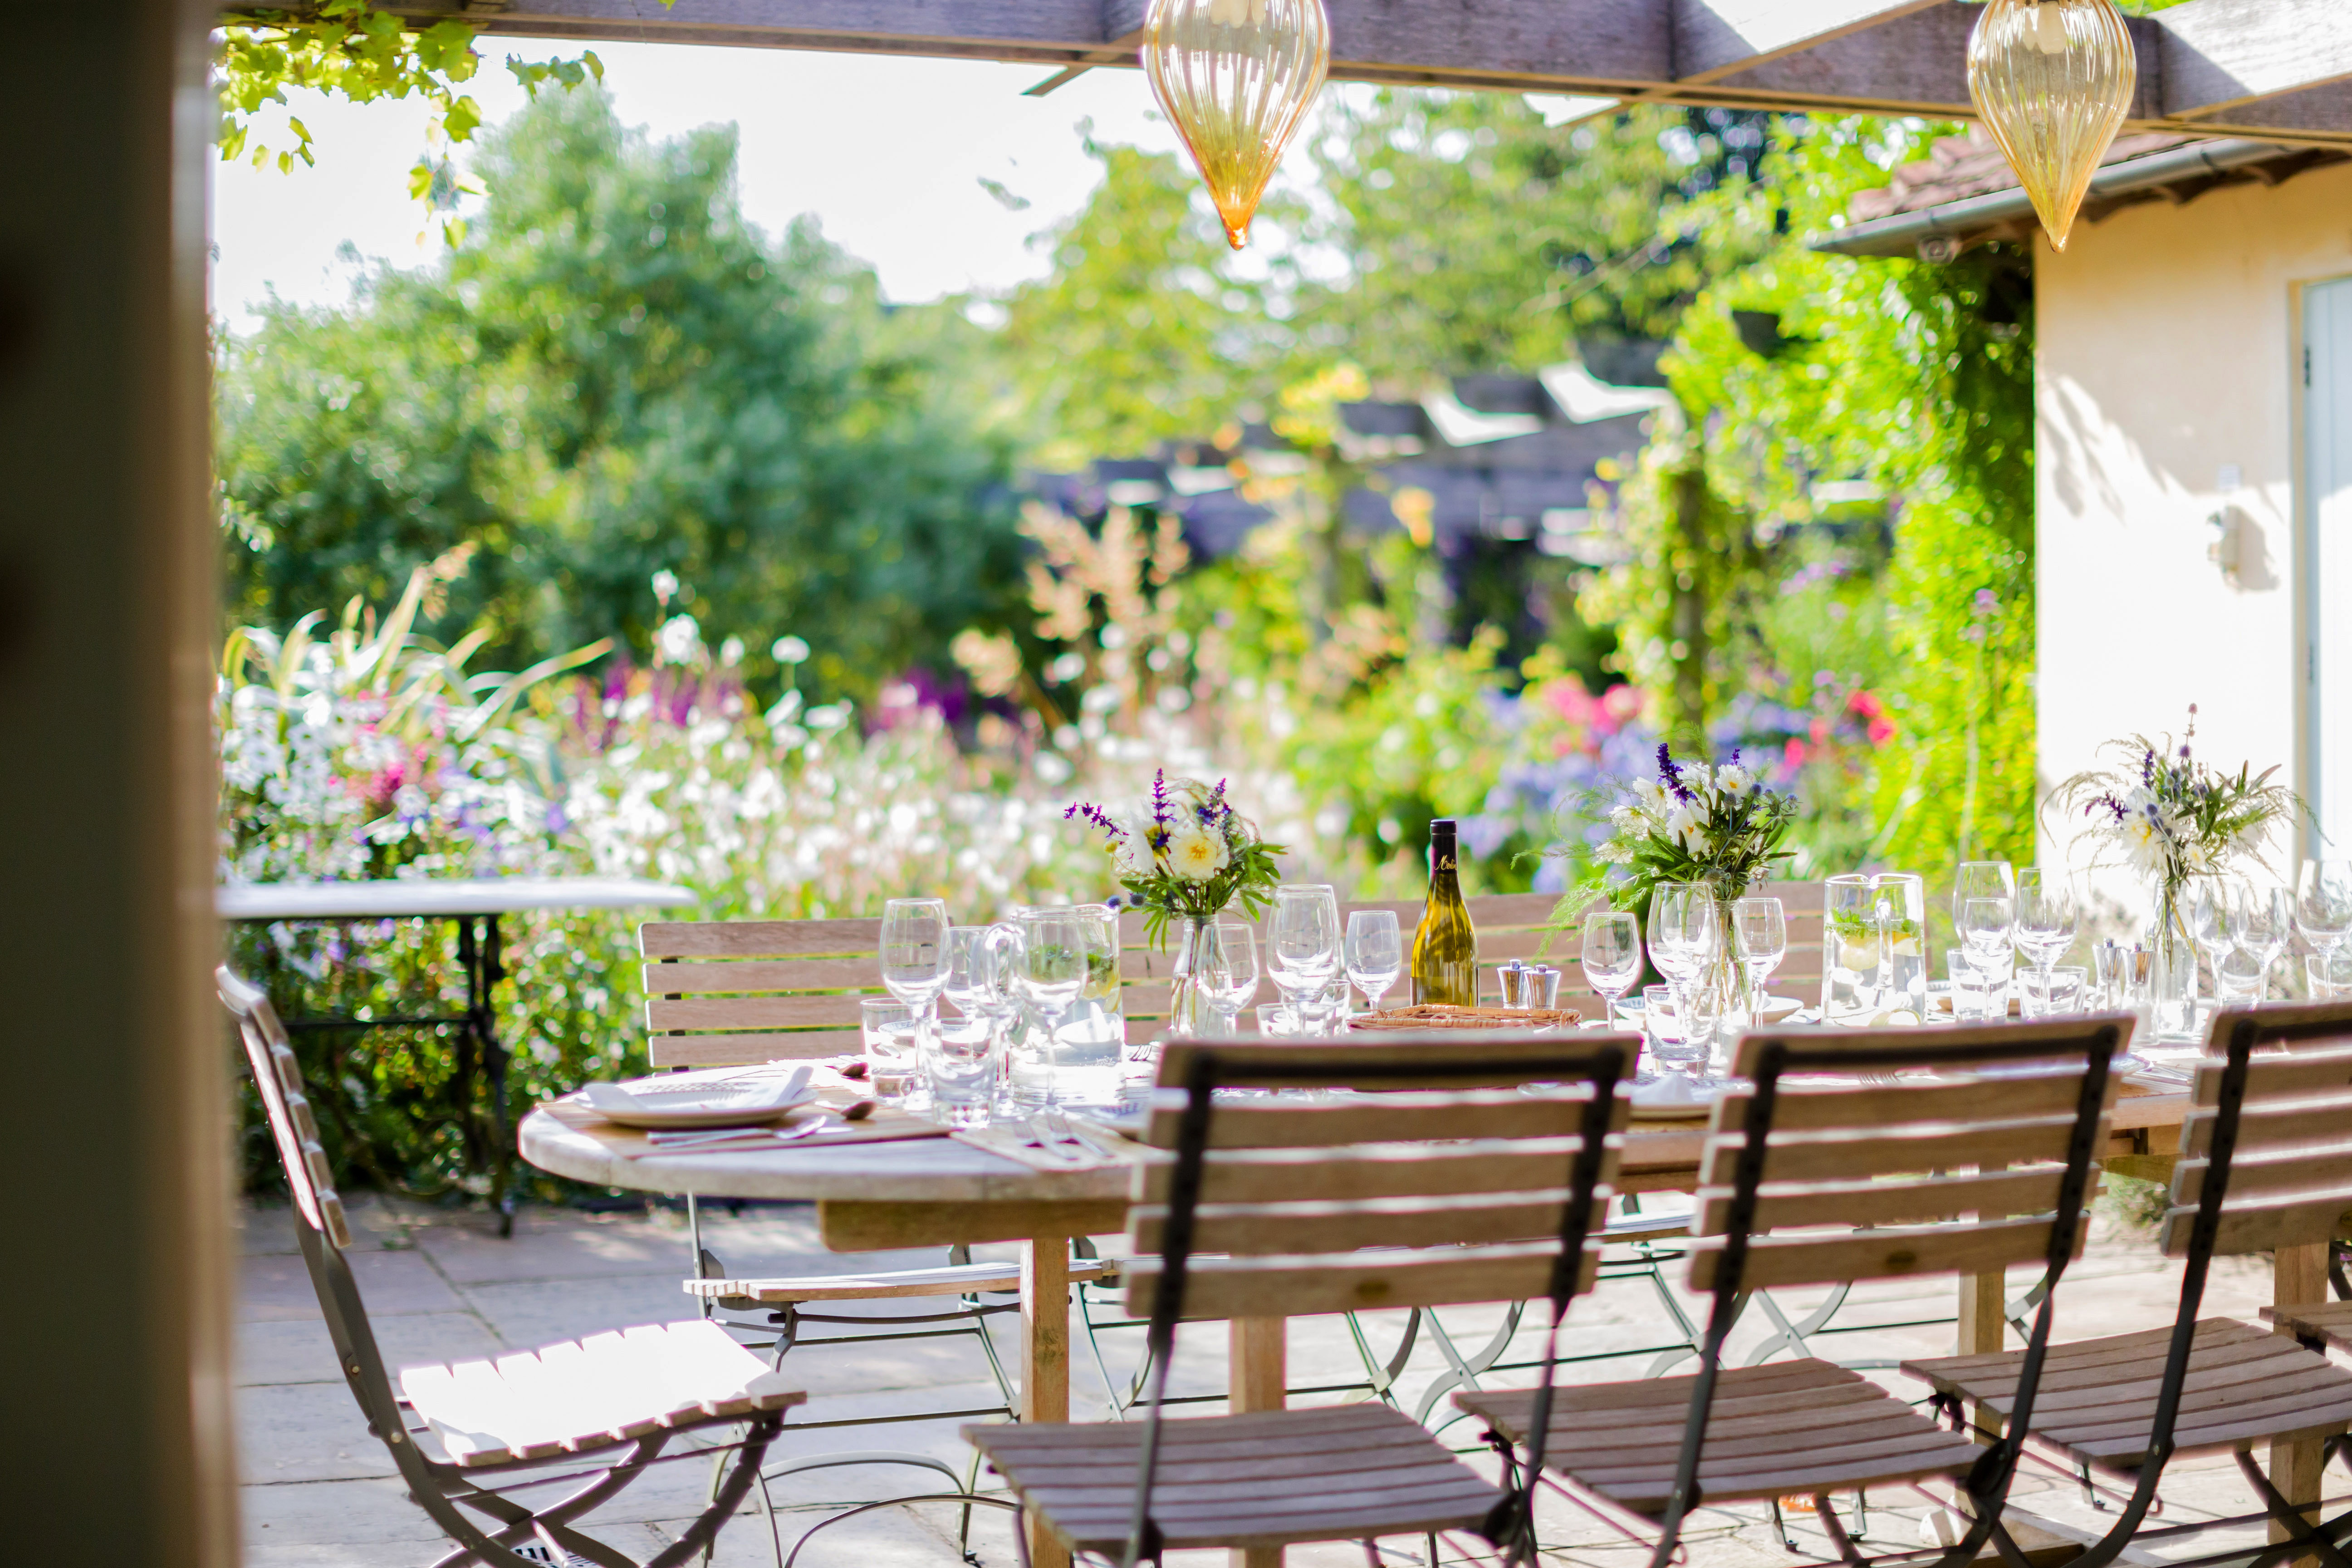 weddings in the idyllic berkshire garden wickham house